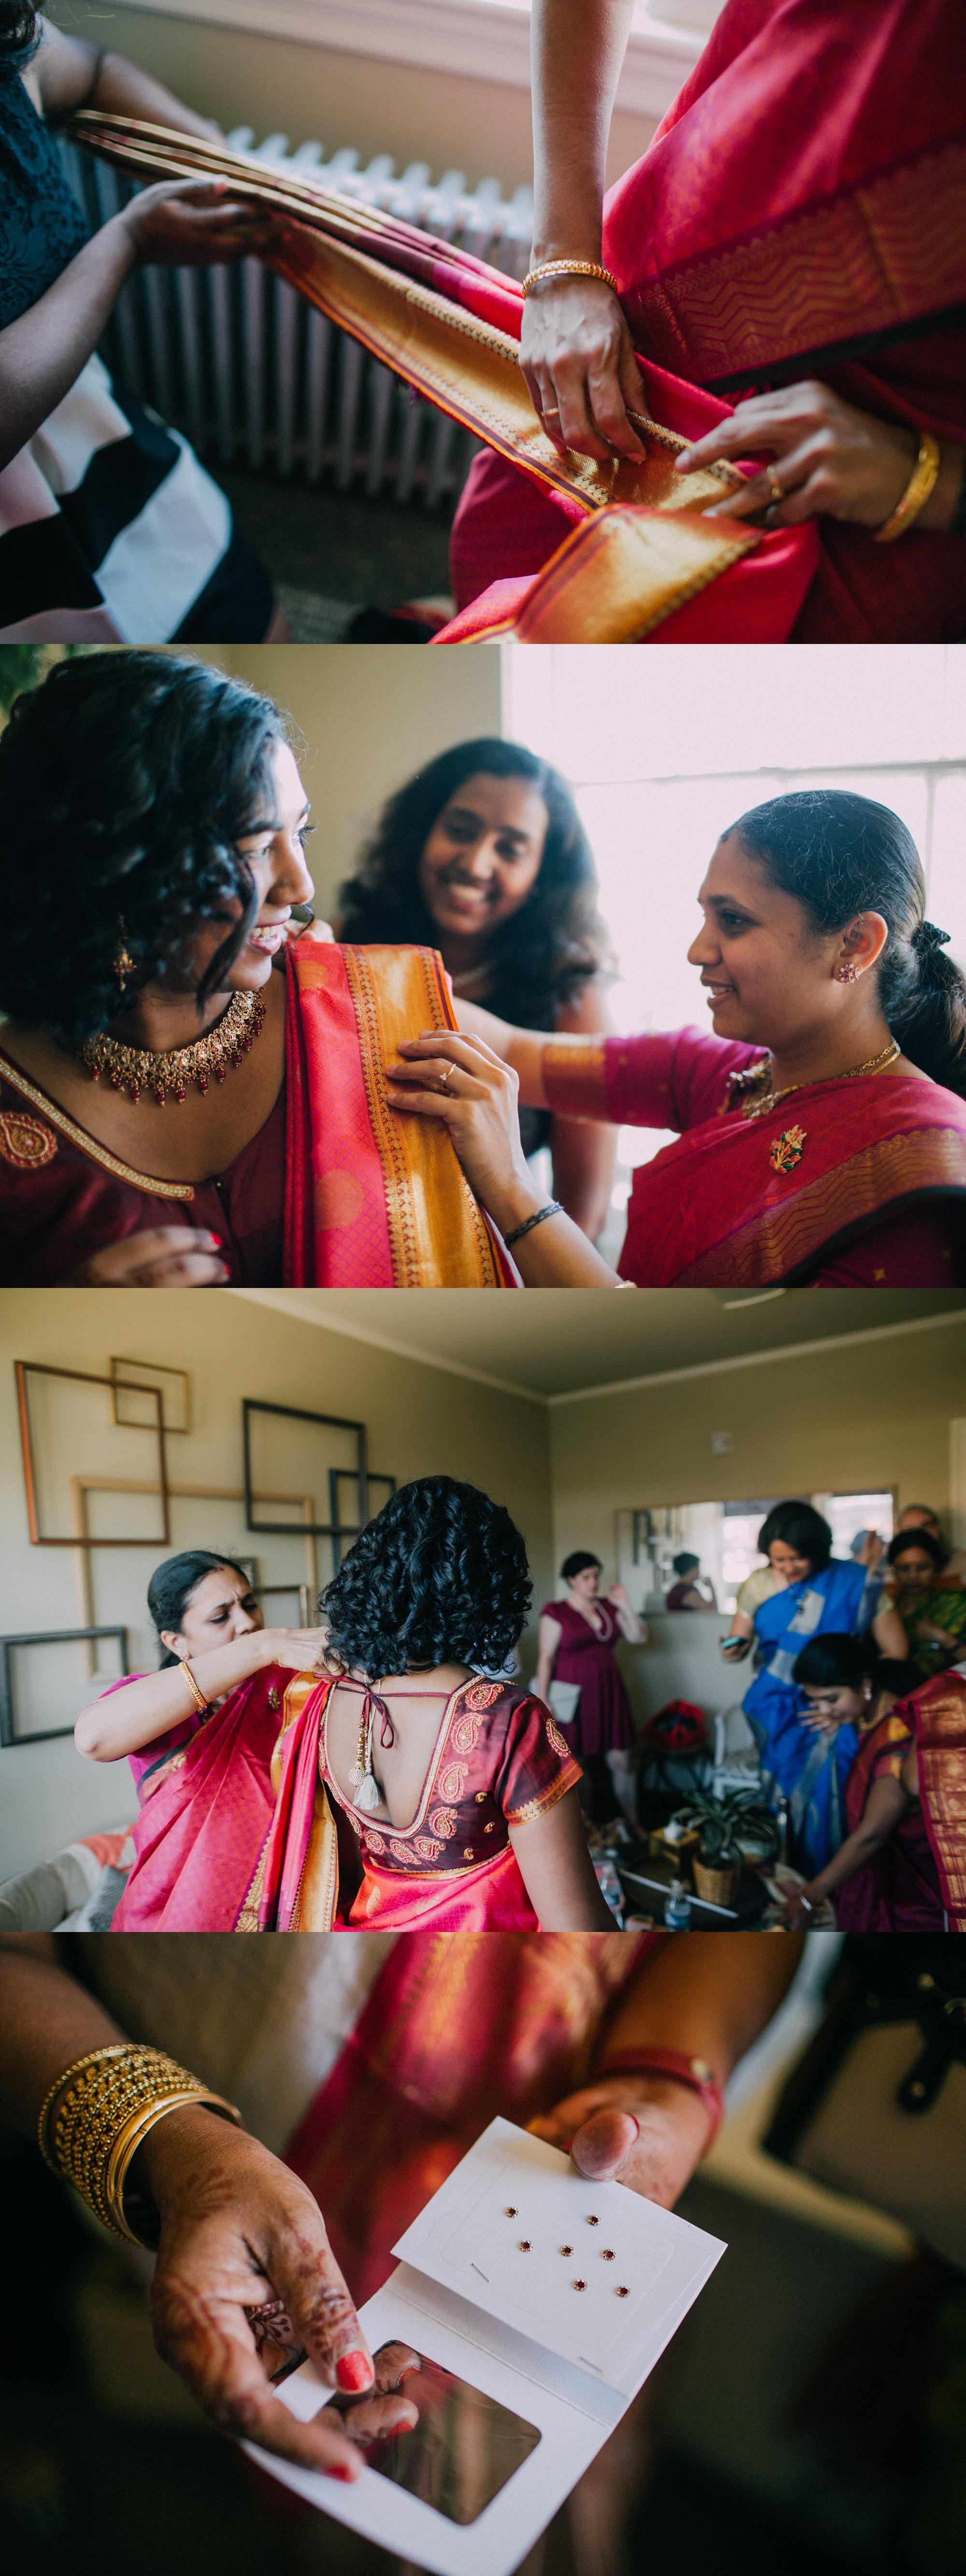 seattle wedding photographer and courthouse elopement photography washington -3.jpg